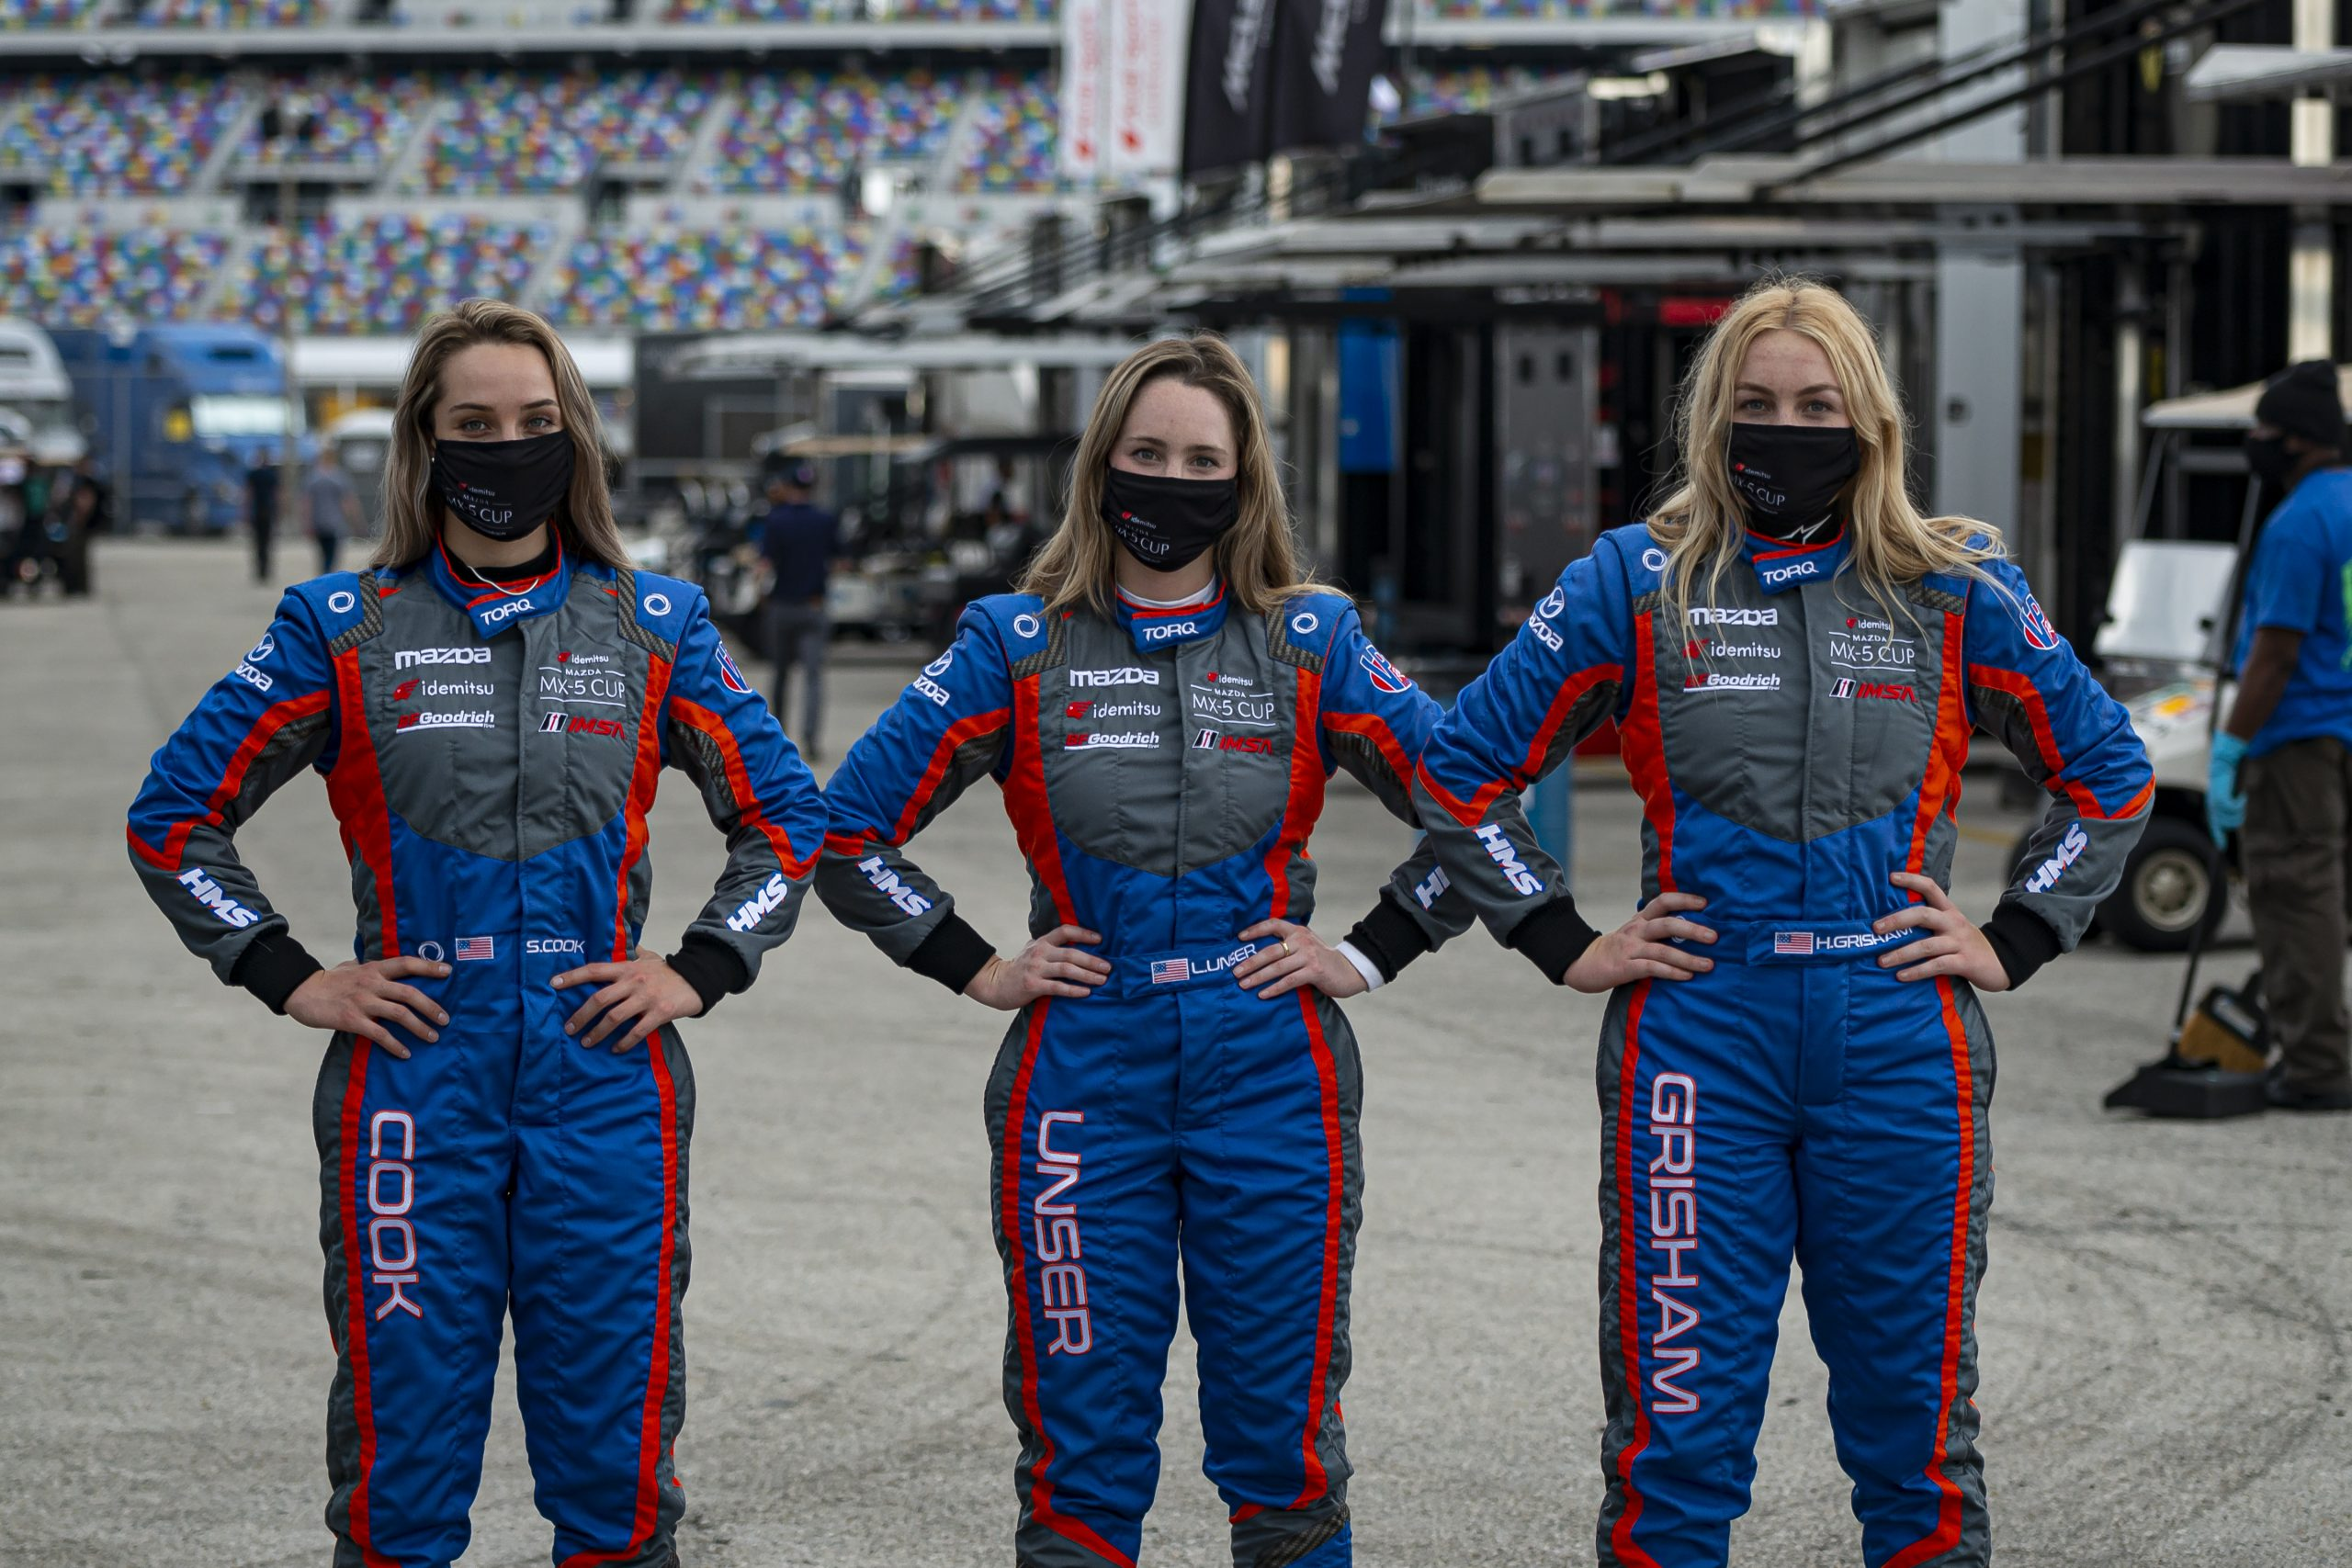 Race Drivers in Pit Lane